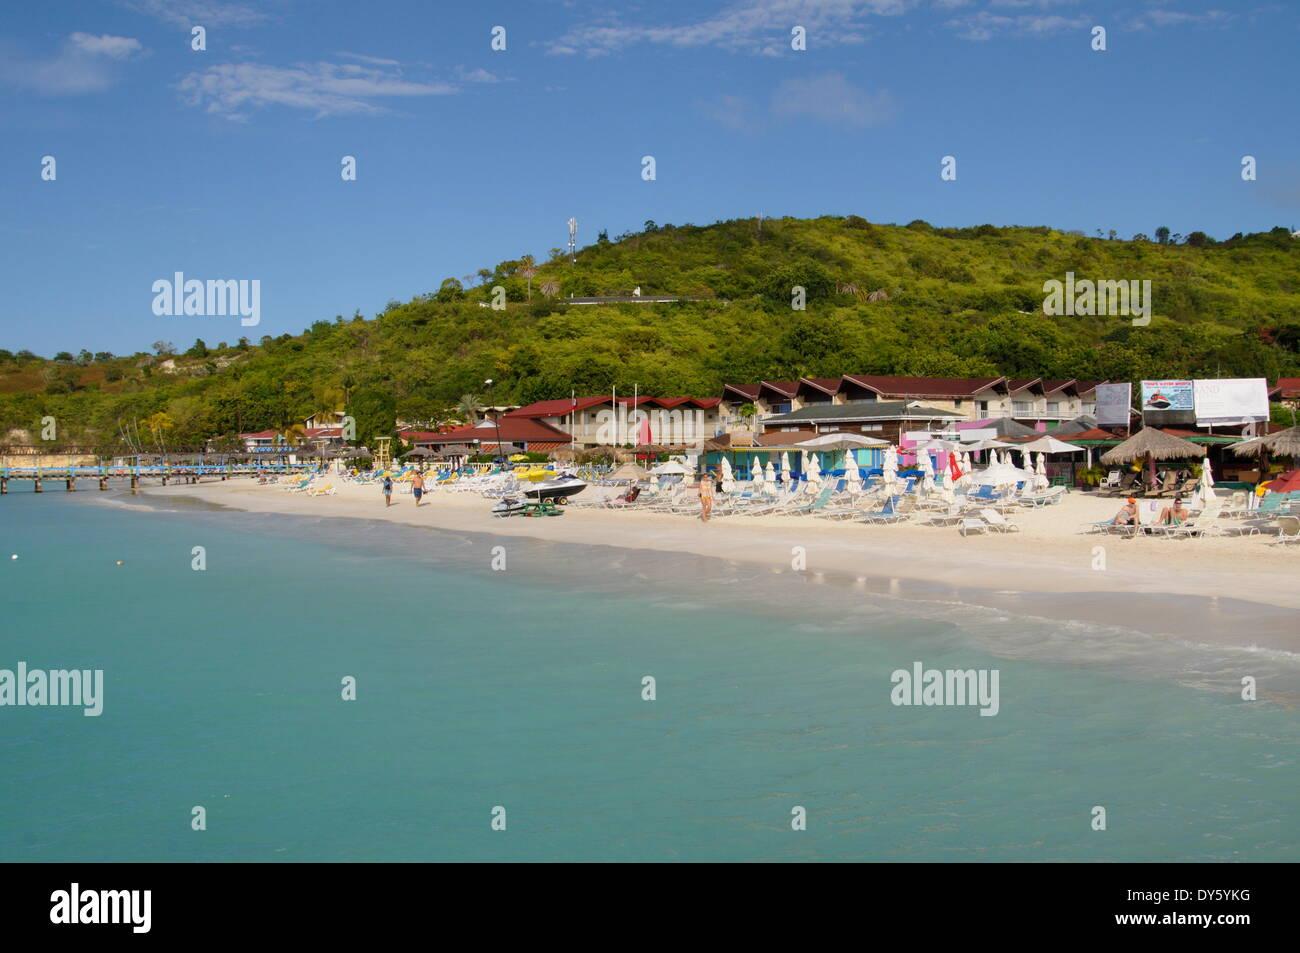 Halcyon Hotel, Dickensons Bay, Antigua, Leeward Islands, West Indies, Caribbean, Central America - Stock Image